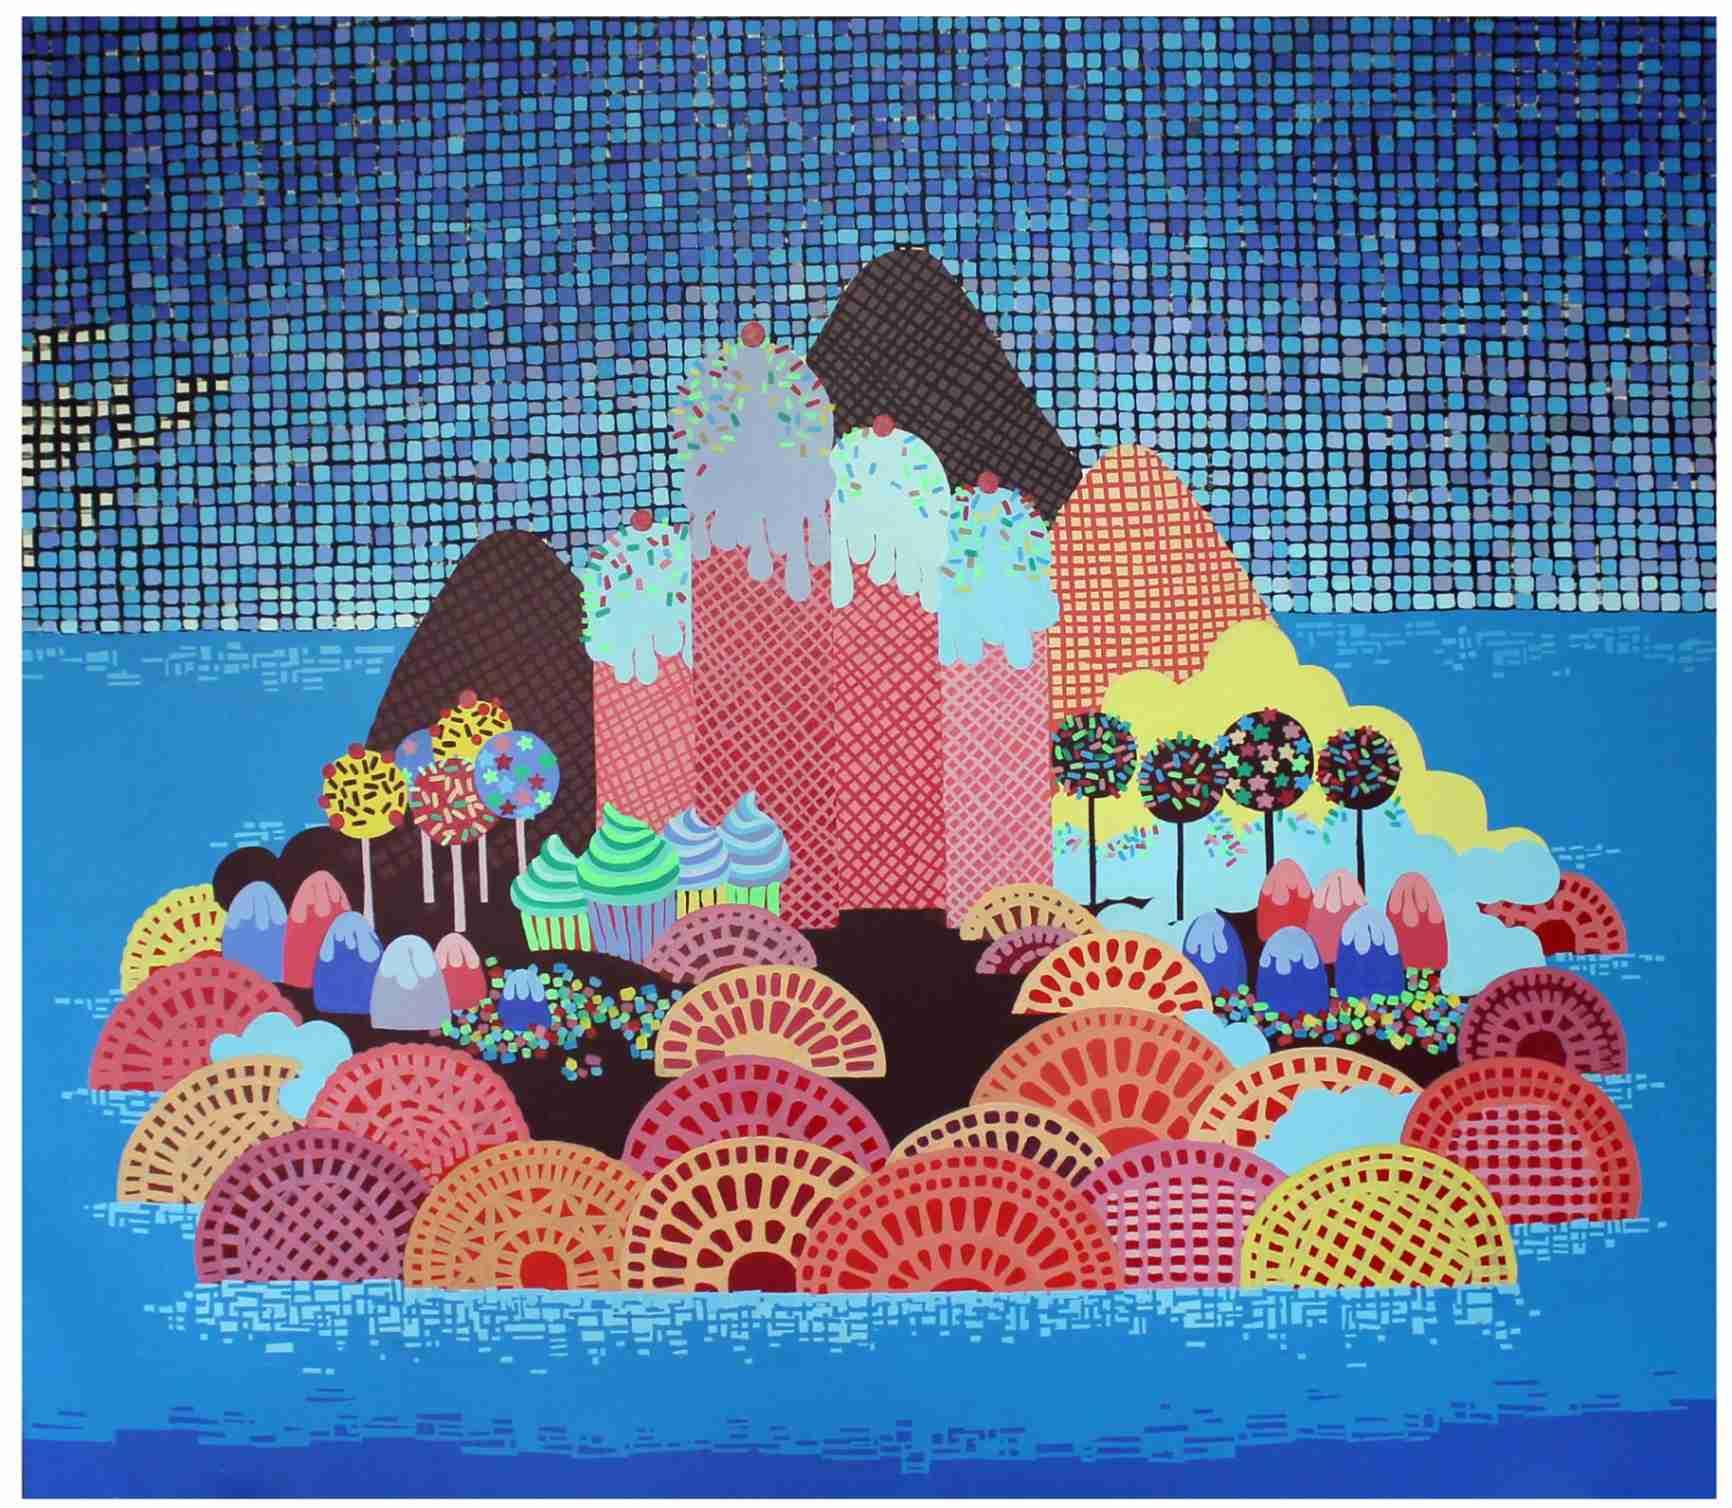 Obra: Candy Island